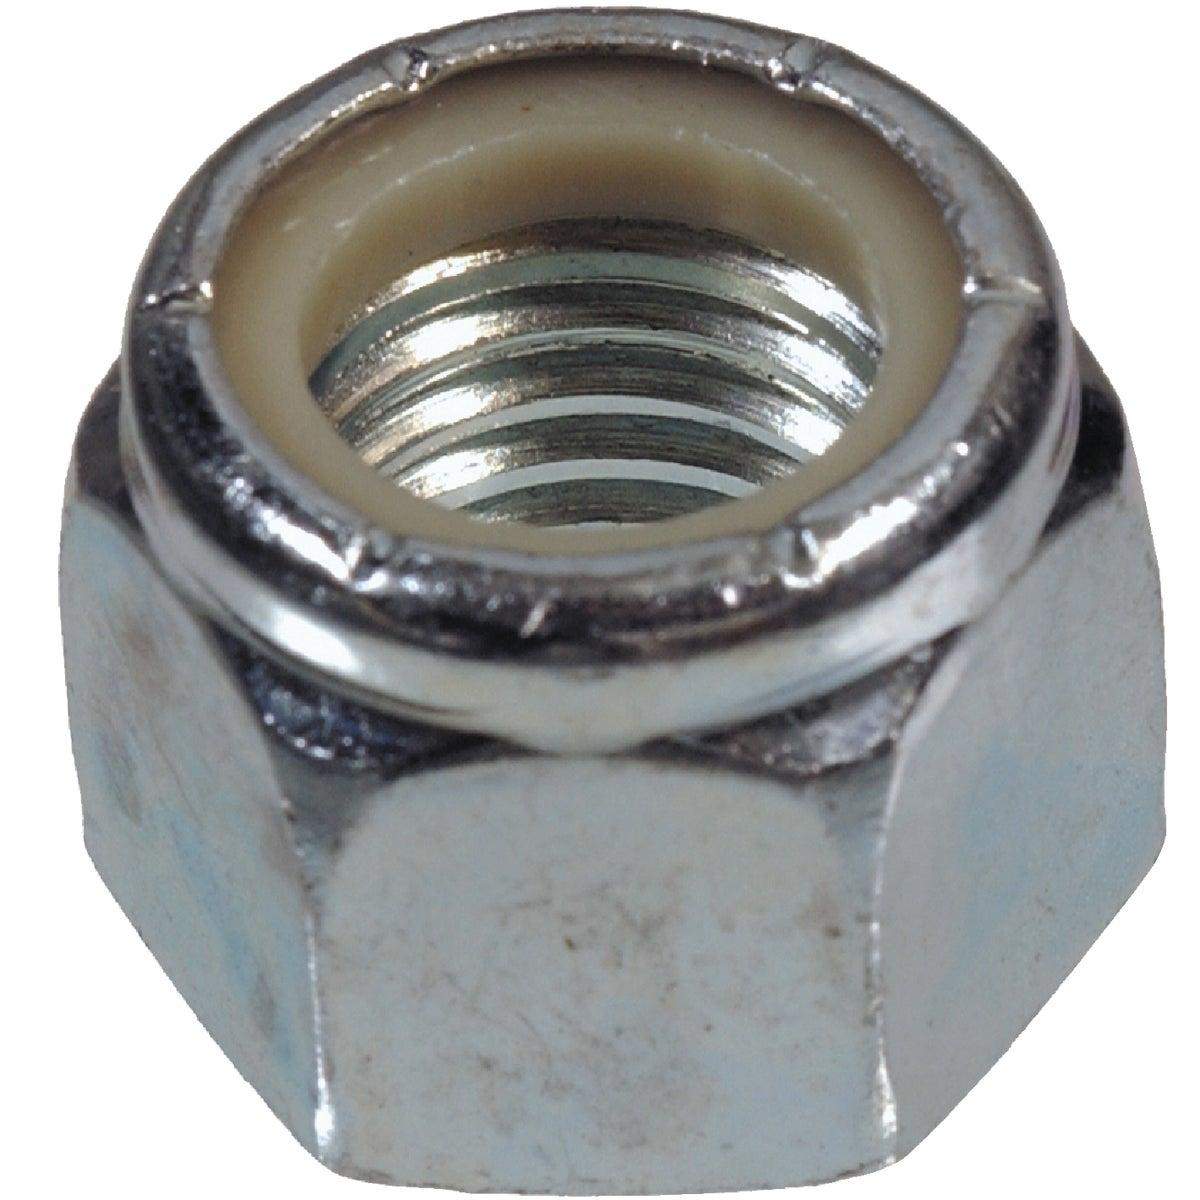 6-32 NYL INSERT LOCK NUT - 180132 by Hillman Fastener